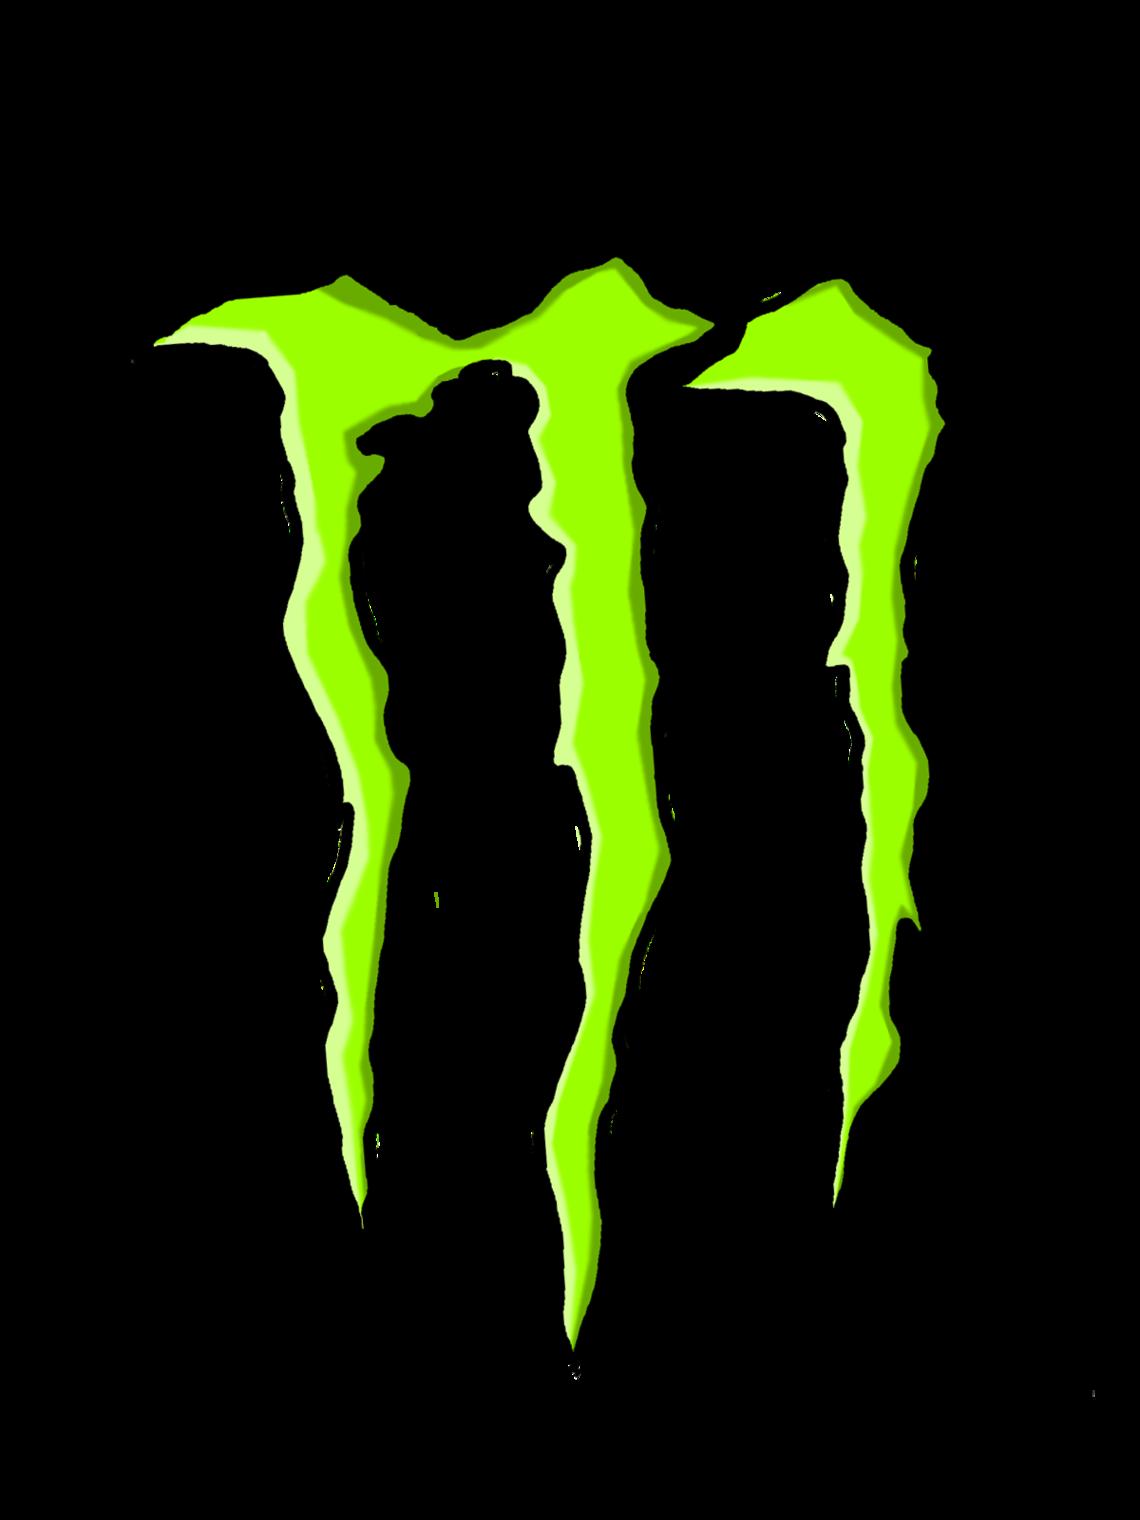 Monster Energy Drink Secretly Promoting 666 The Mark of